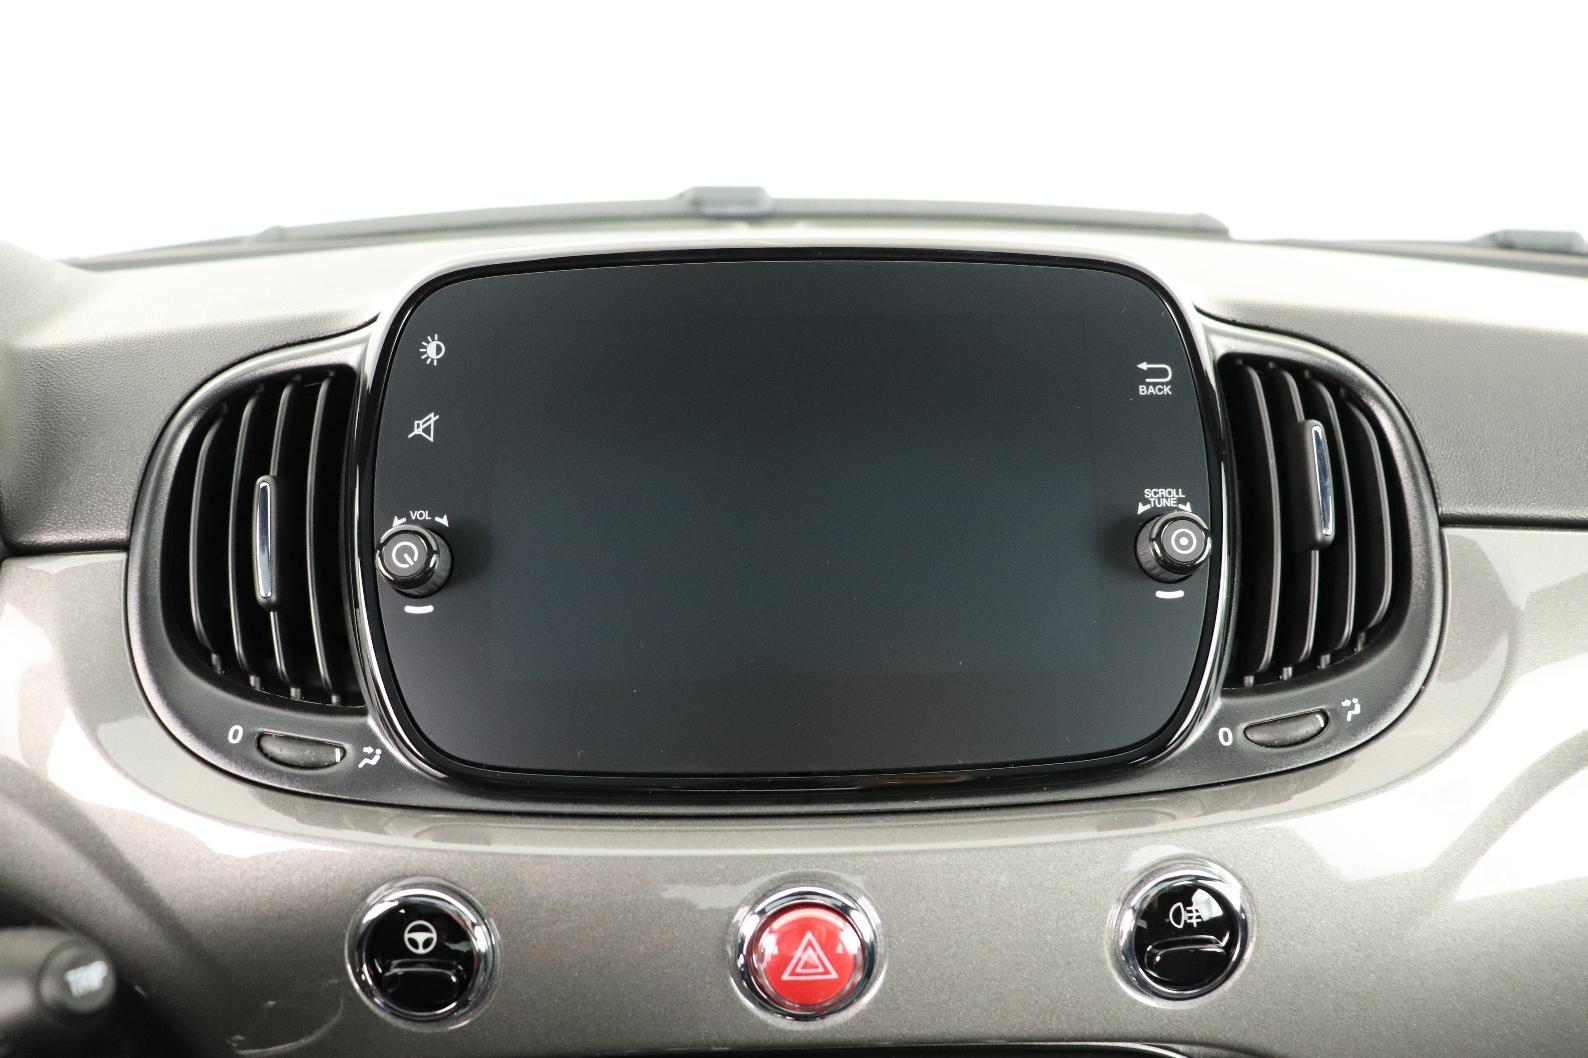 FIAT 500 SERIE 8 EURO 6D-TEMP 500 1.2 69 ch S/S Dualogic Lounge